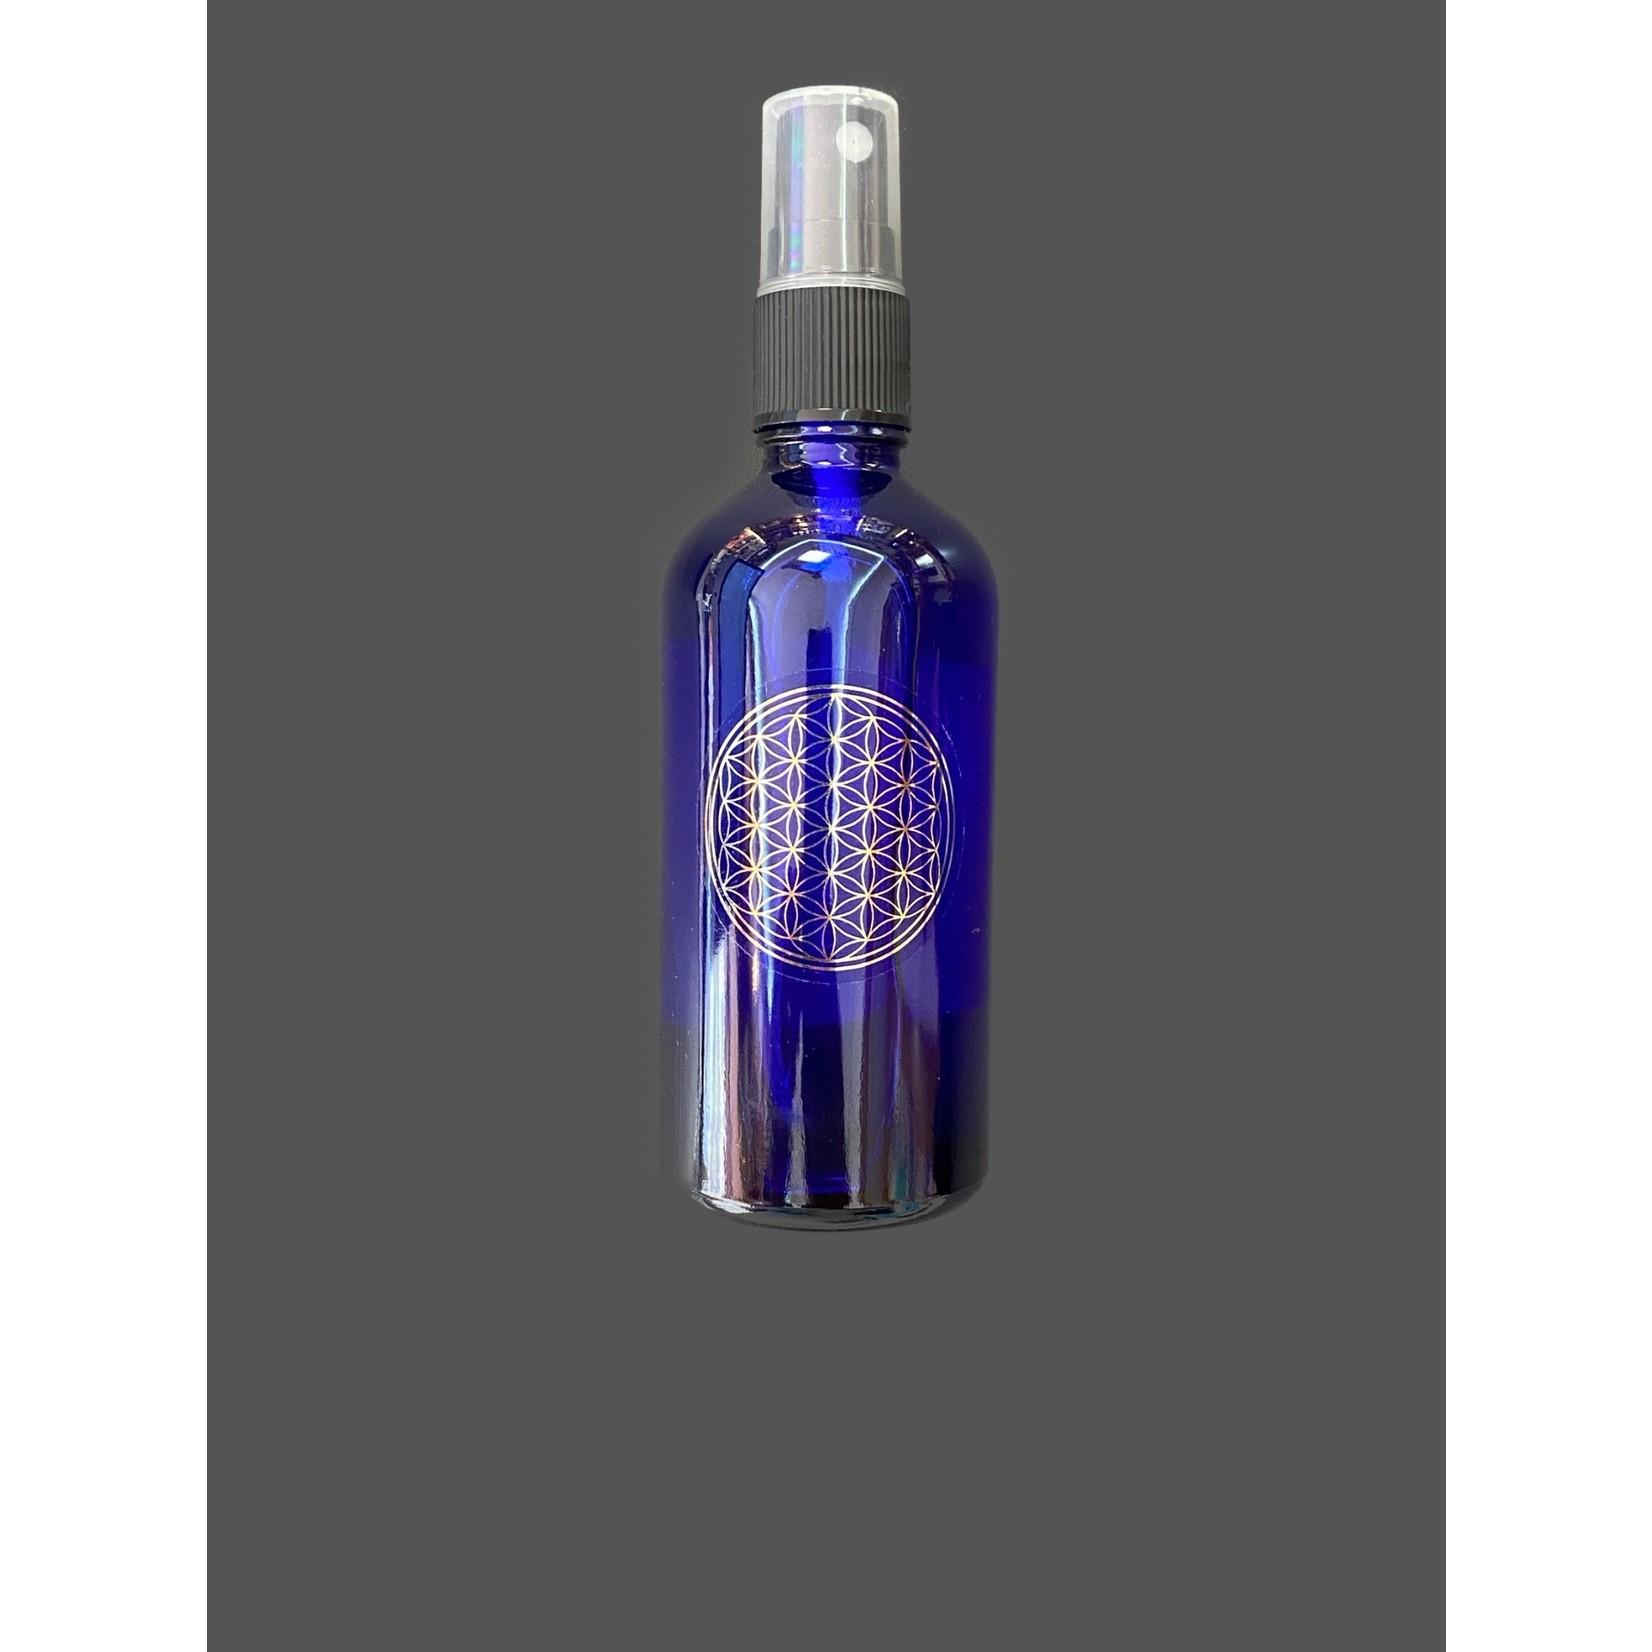 Spray vibracional